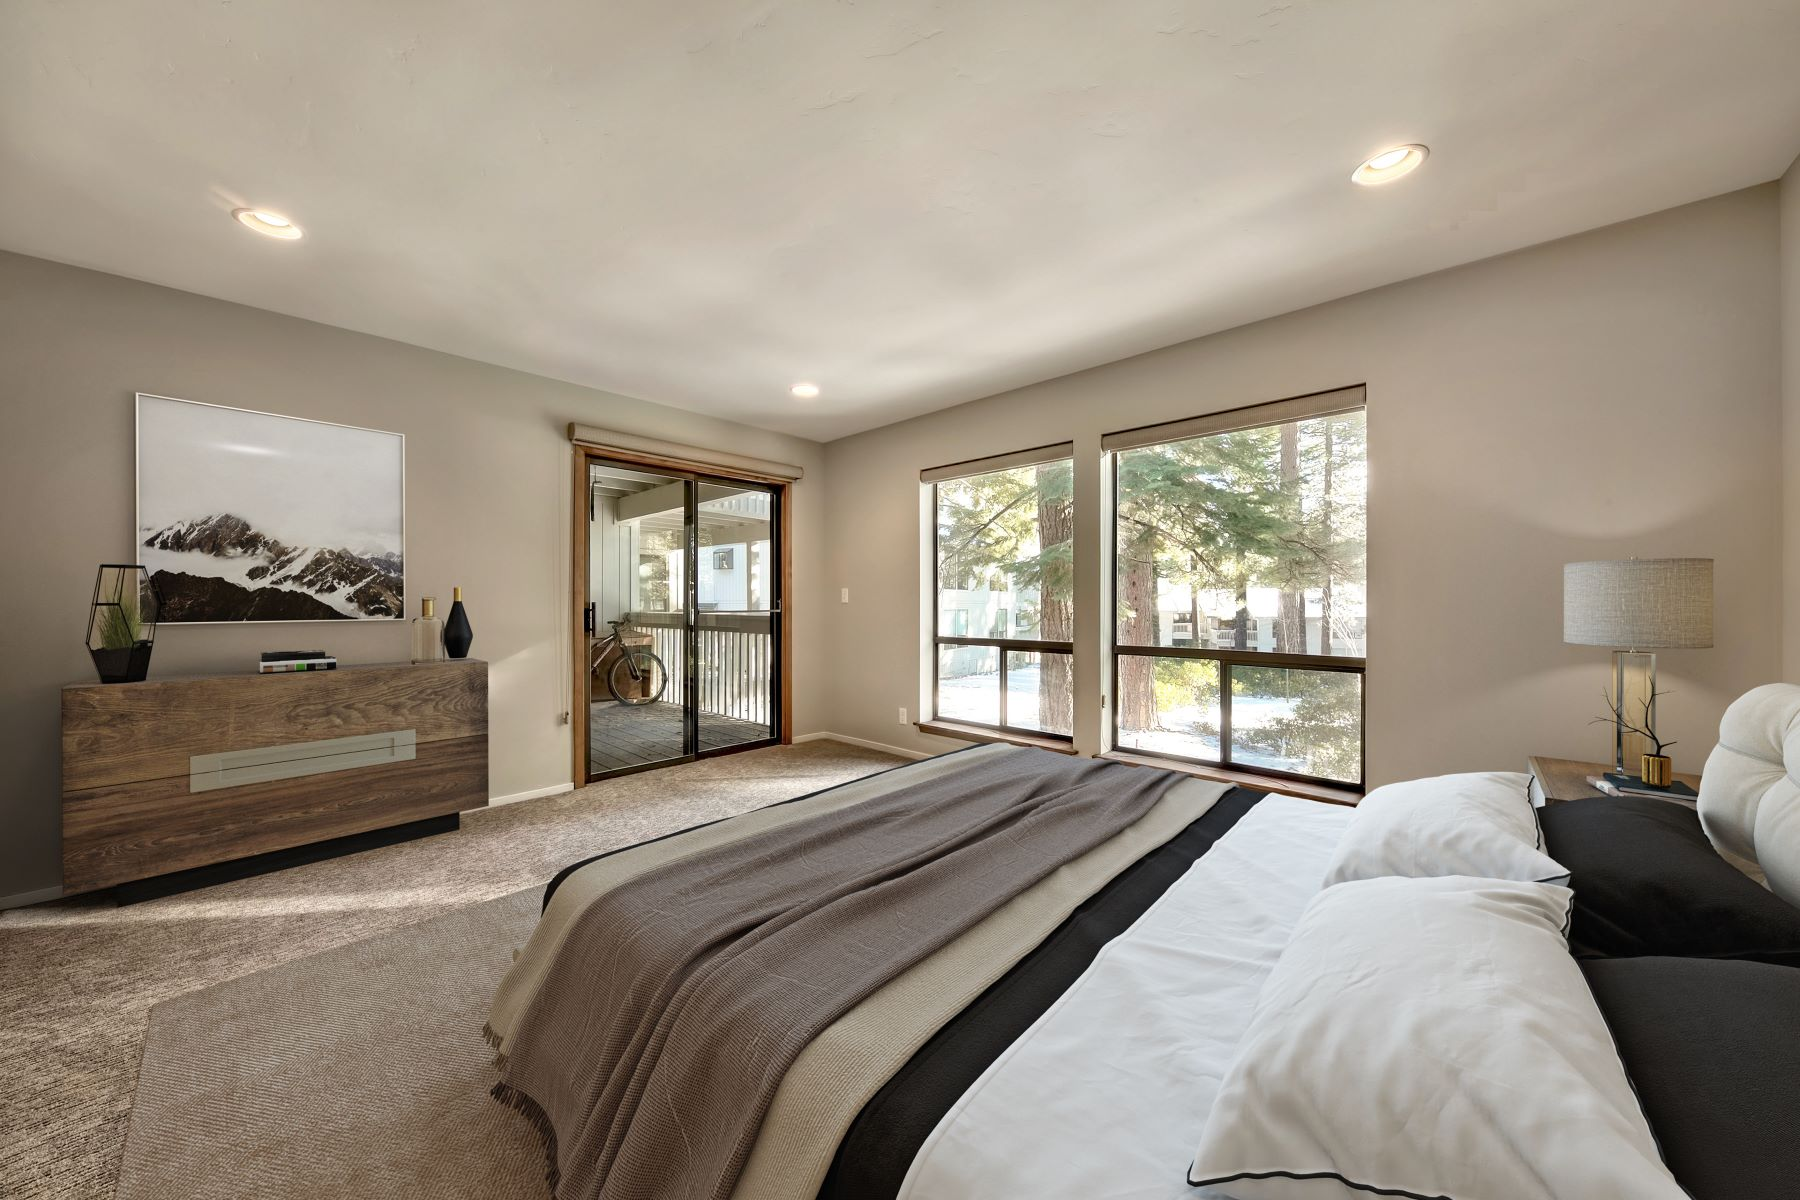 Additional photo for property listing at 171 Village Blvd. #6 Incline Village, NV 89451 171 Village Boulevard #6 Incline Village, Nevada 89451 United States